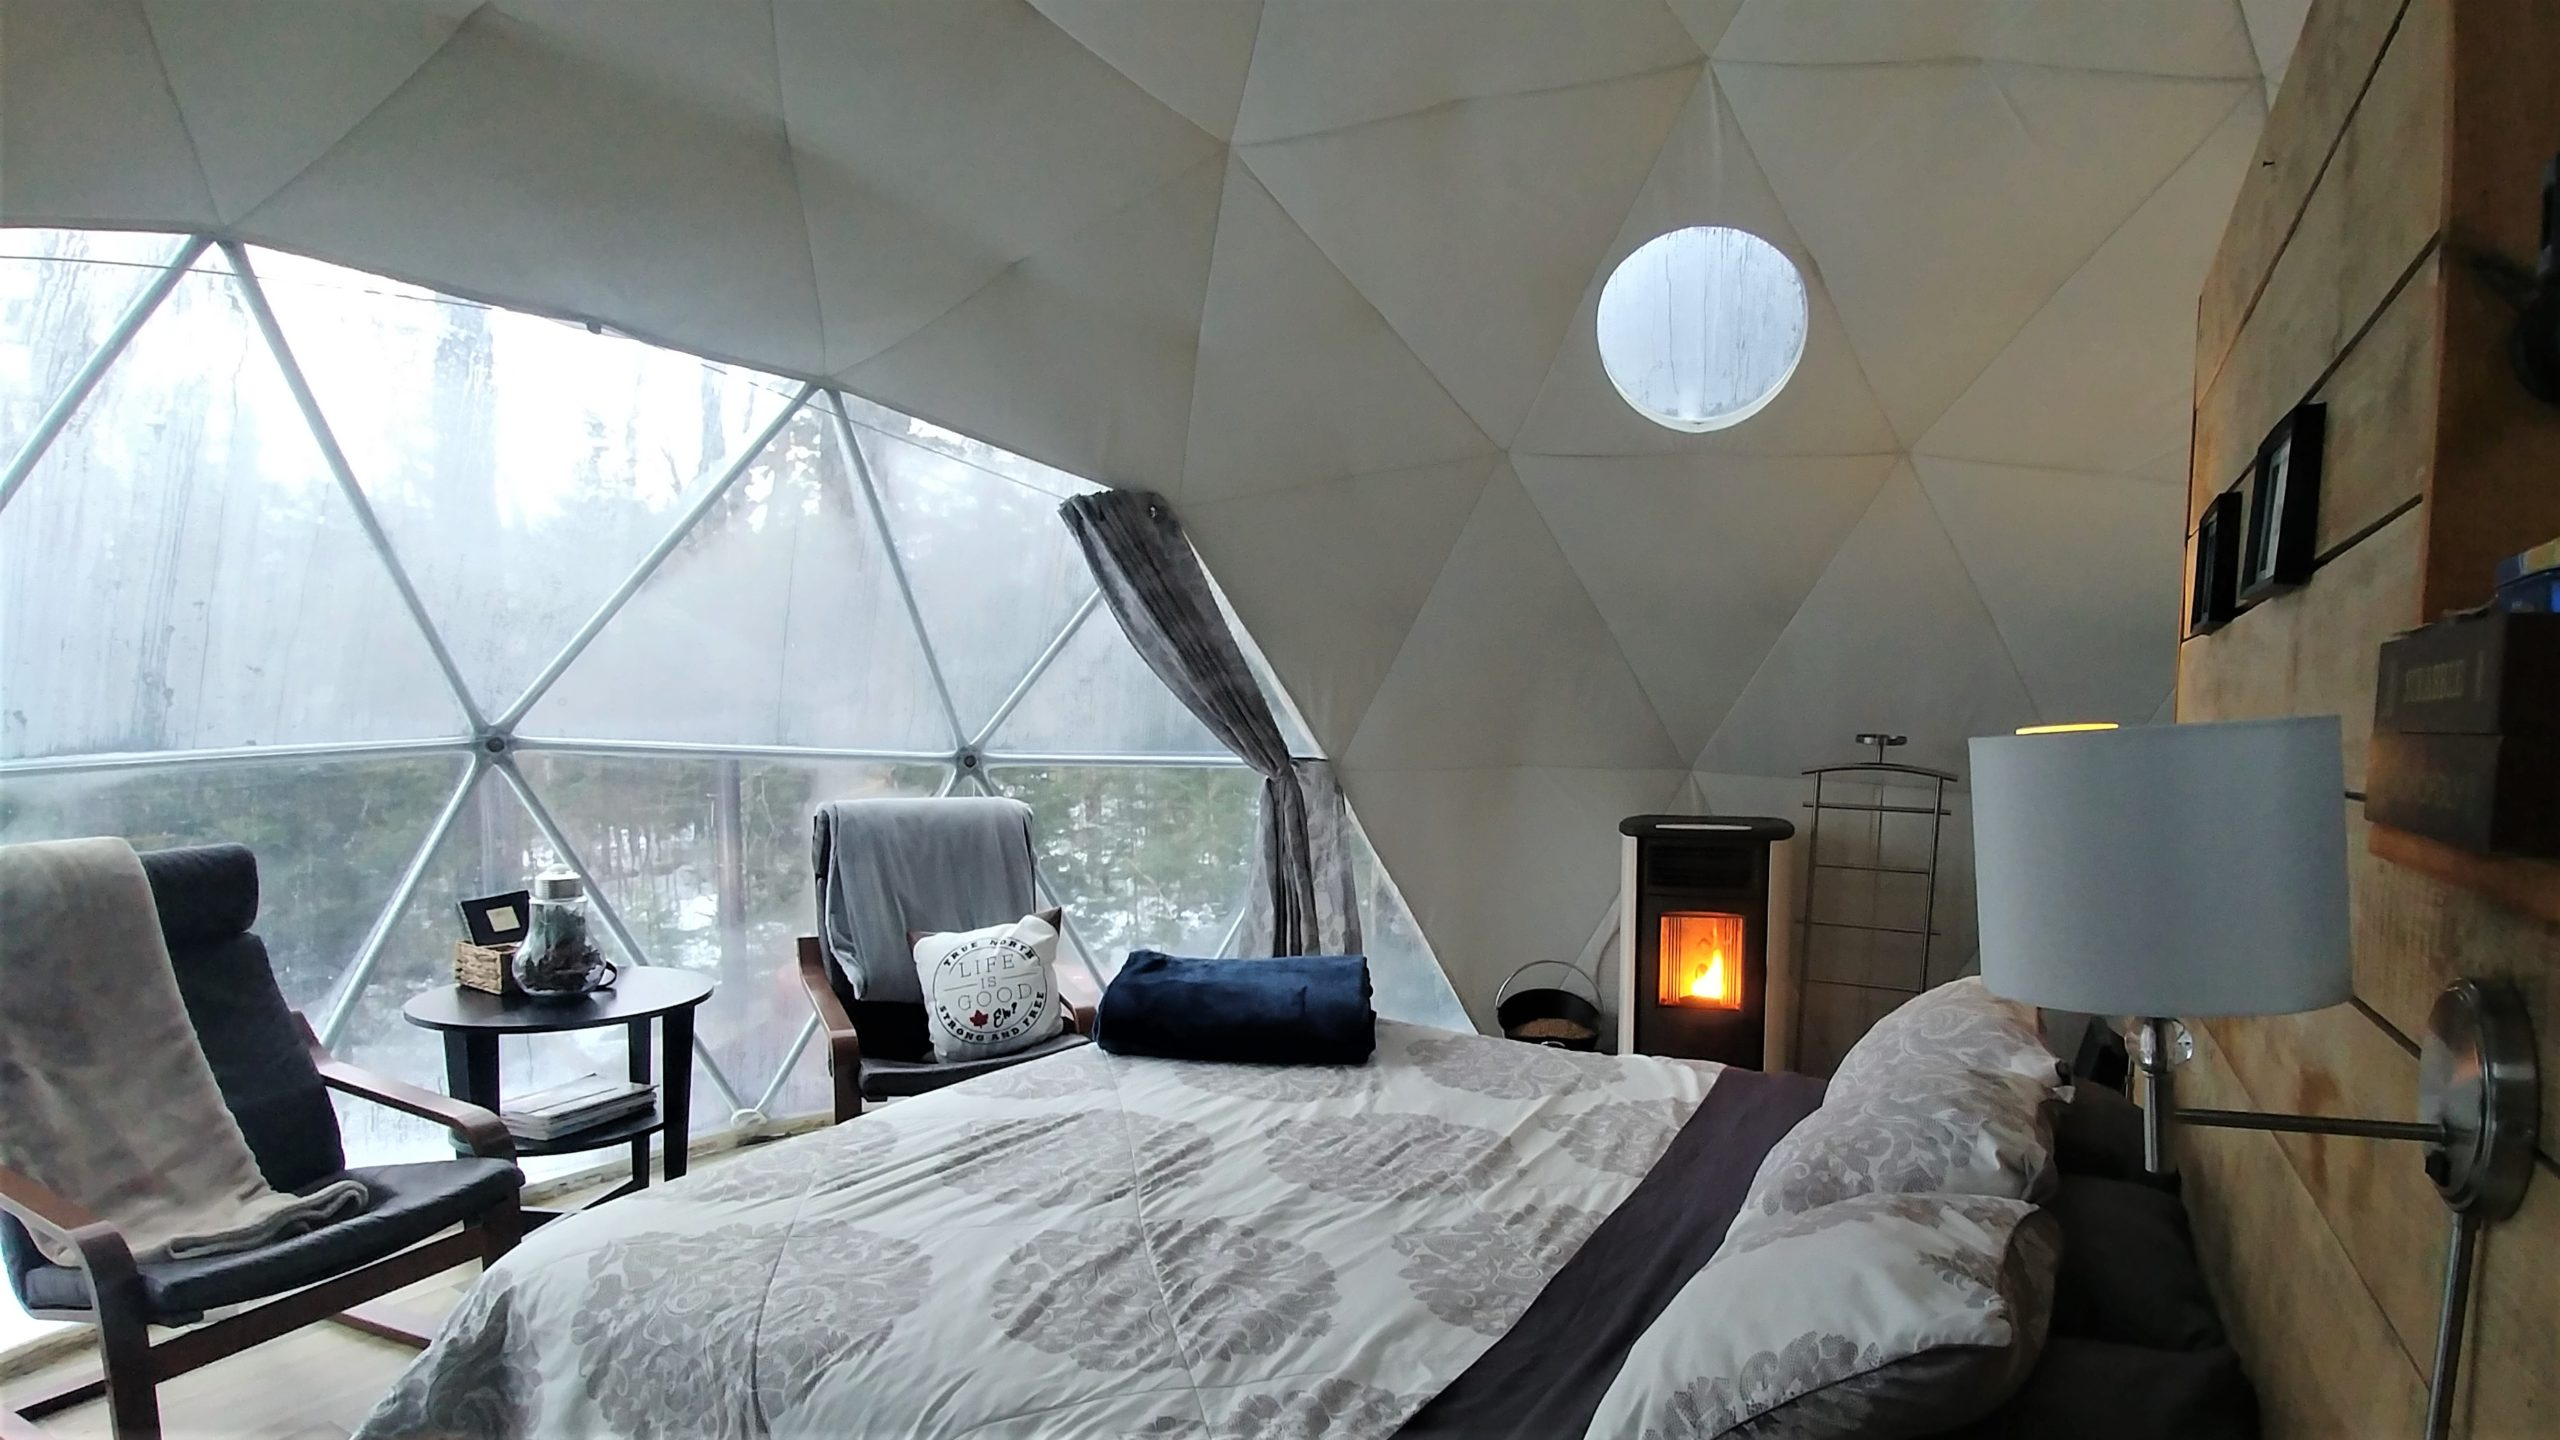 ridgeback lodge dome stargazer hebergement insolite nouveau-brunswick blog voyage canada